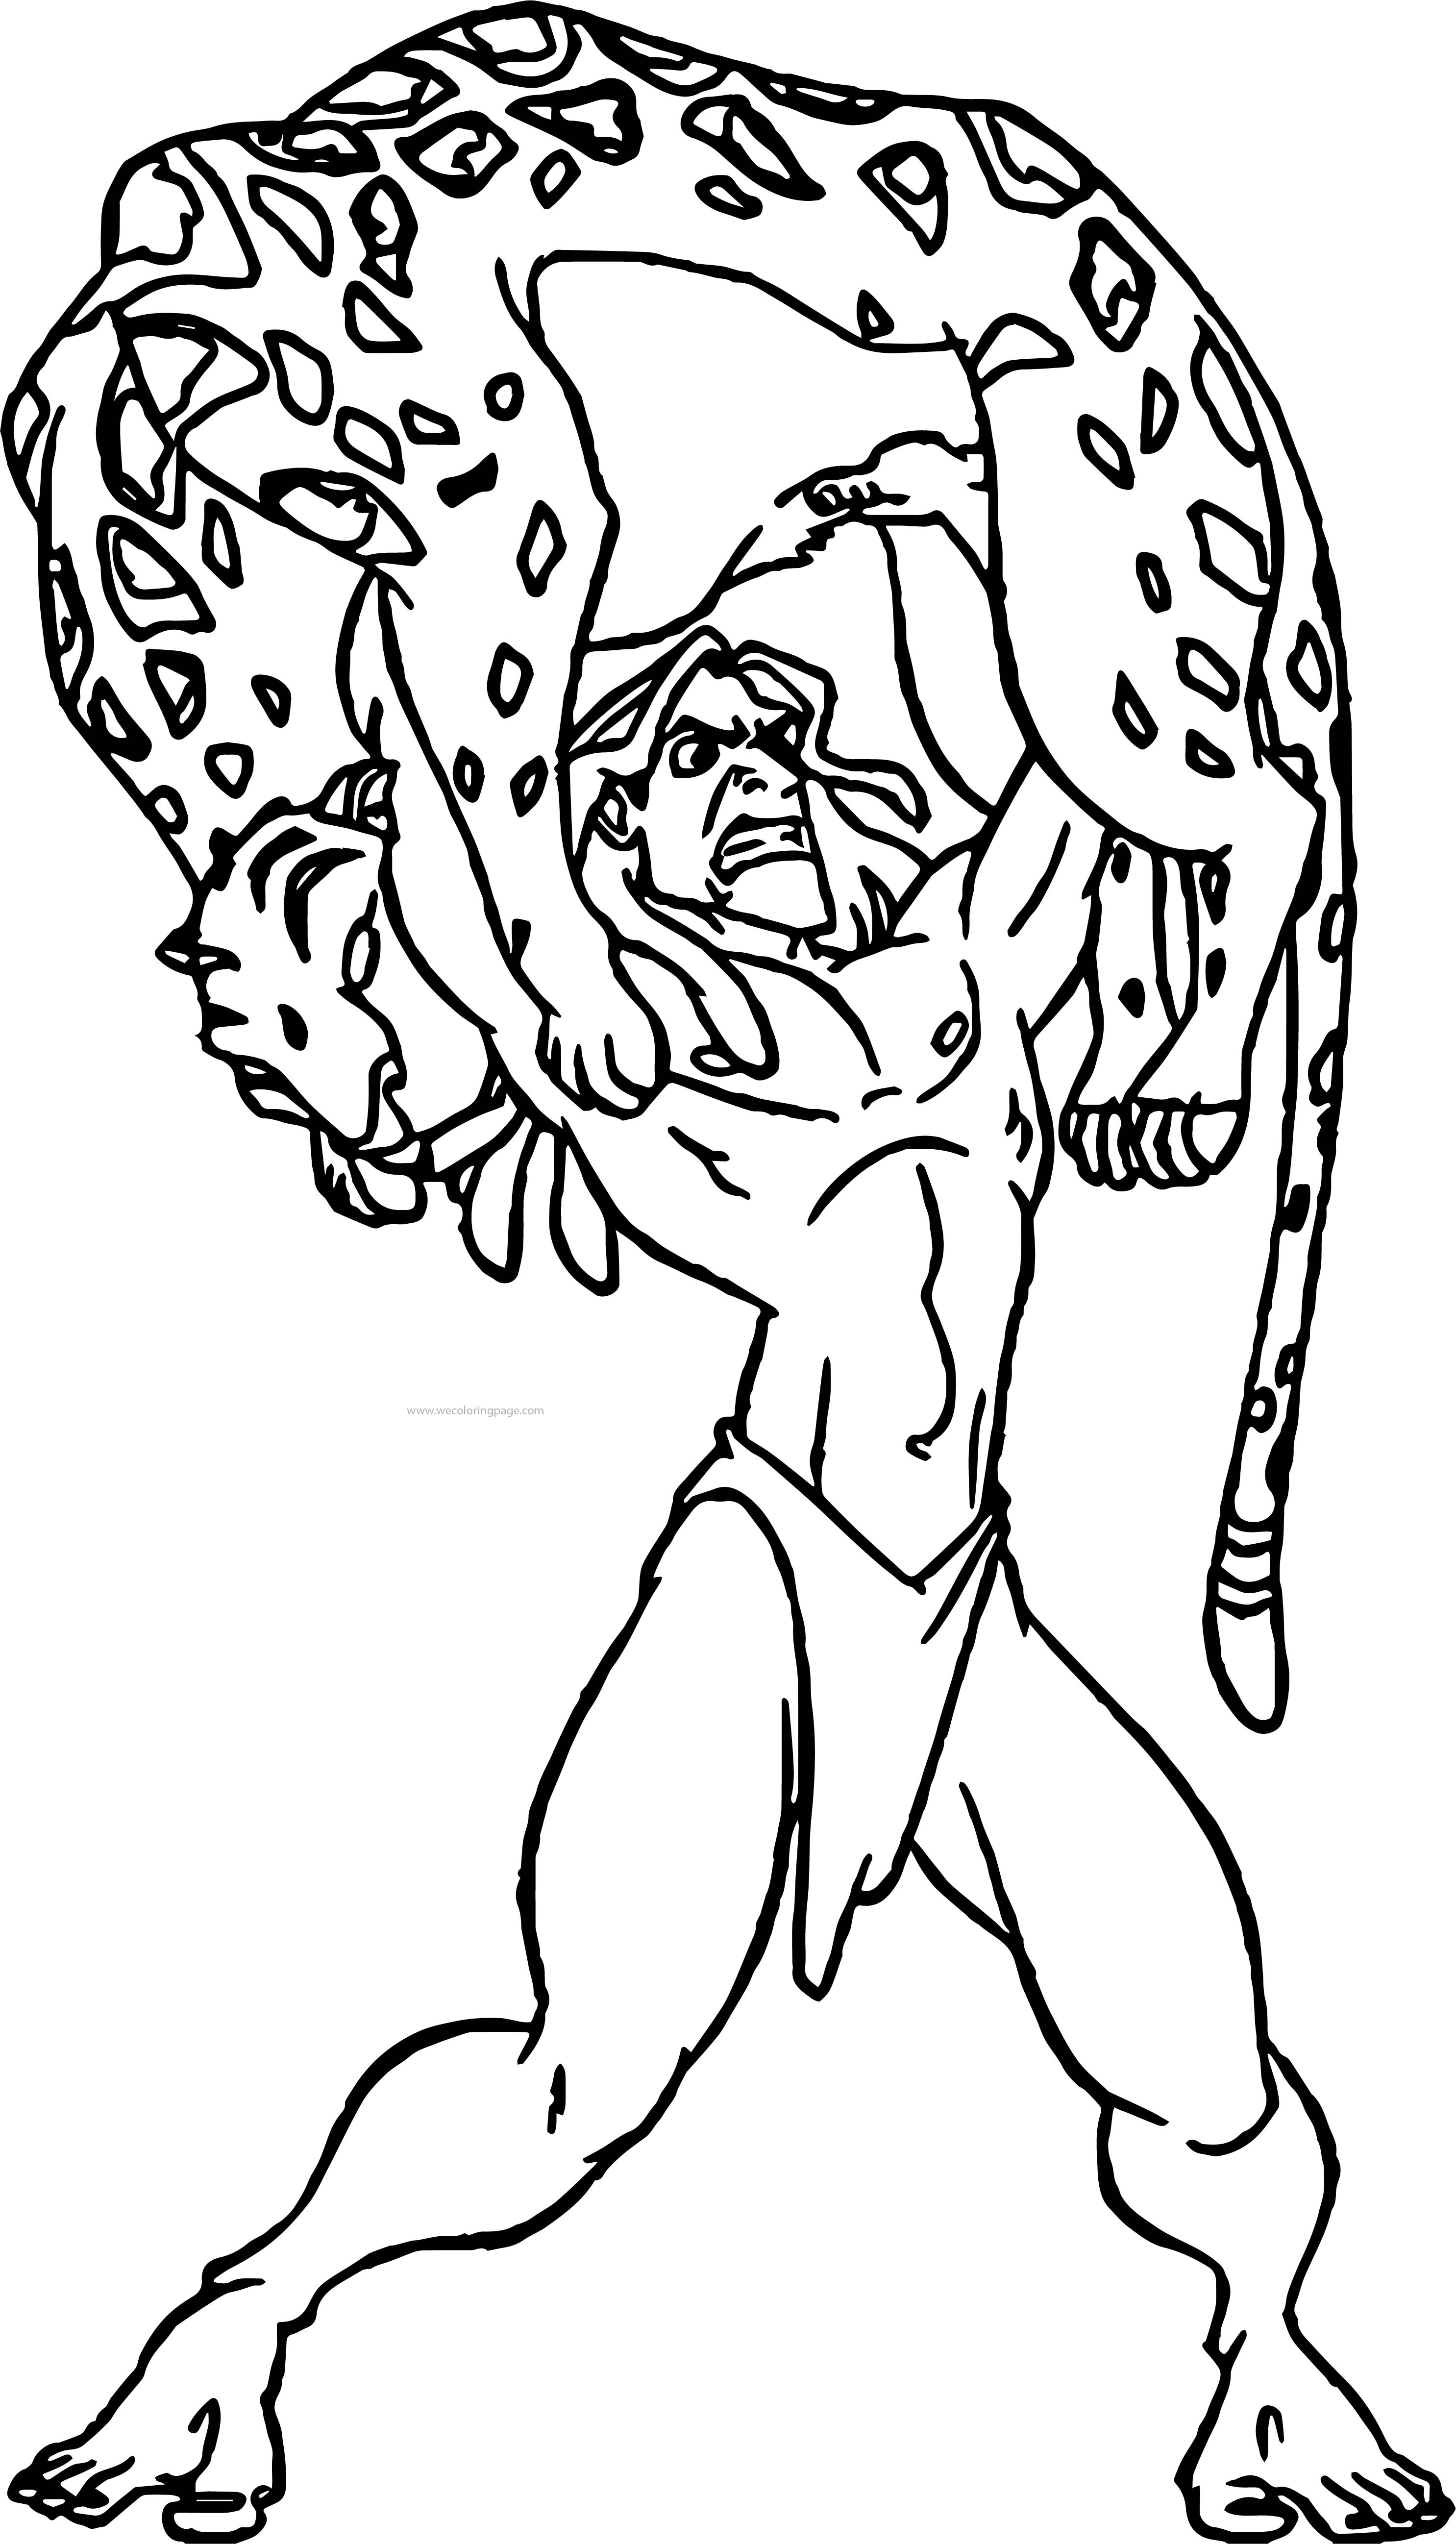 Tarzan Catch Lion Coloring Page